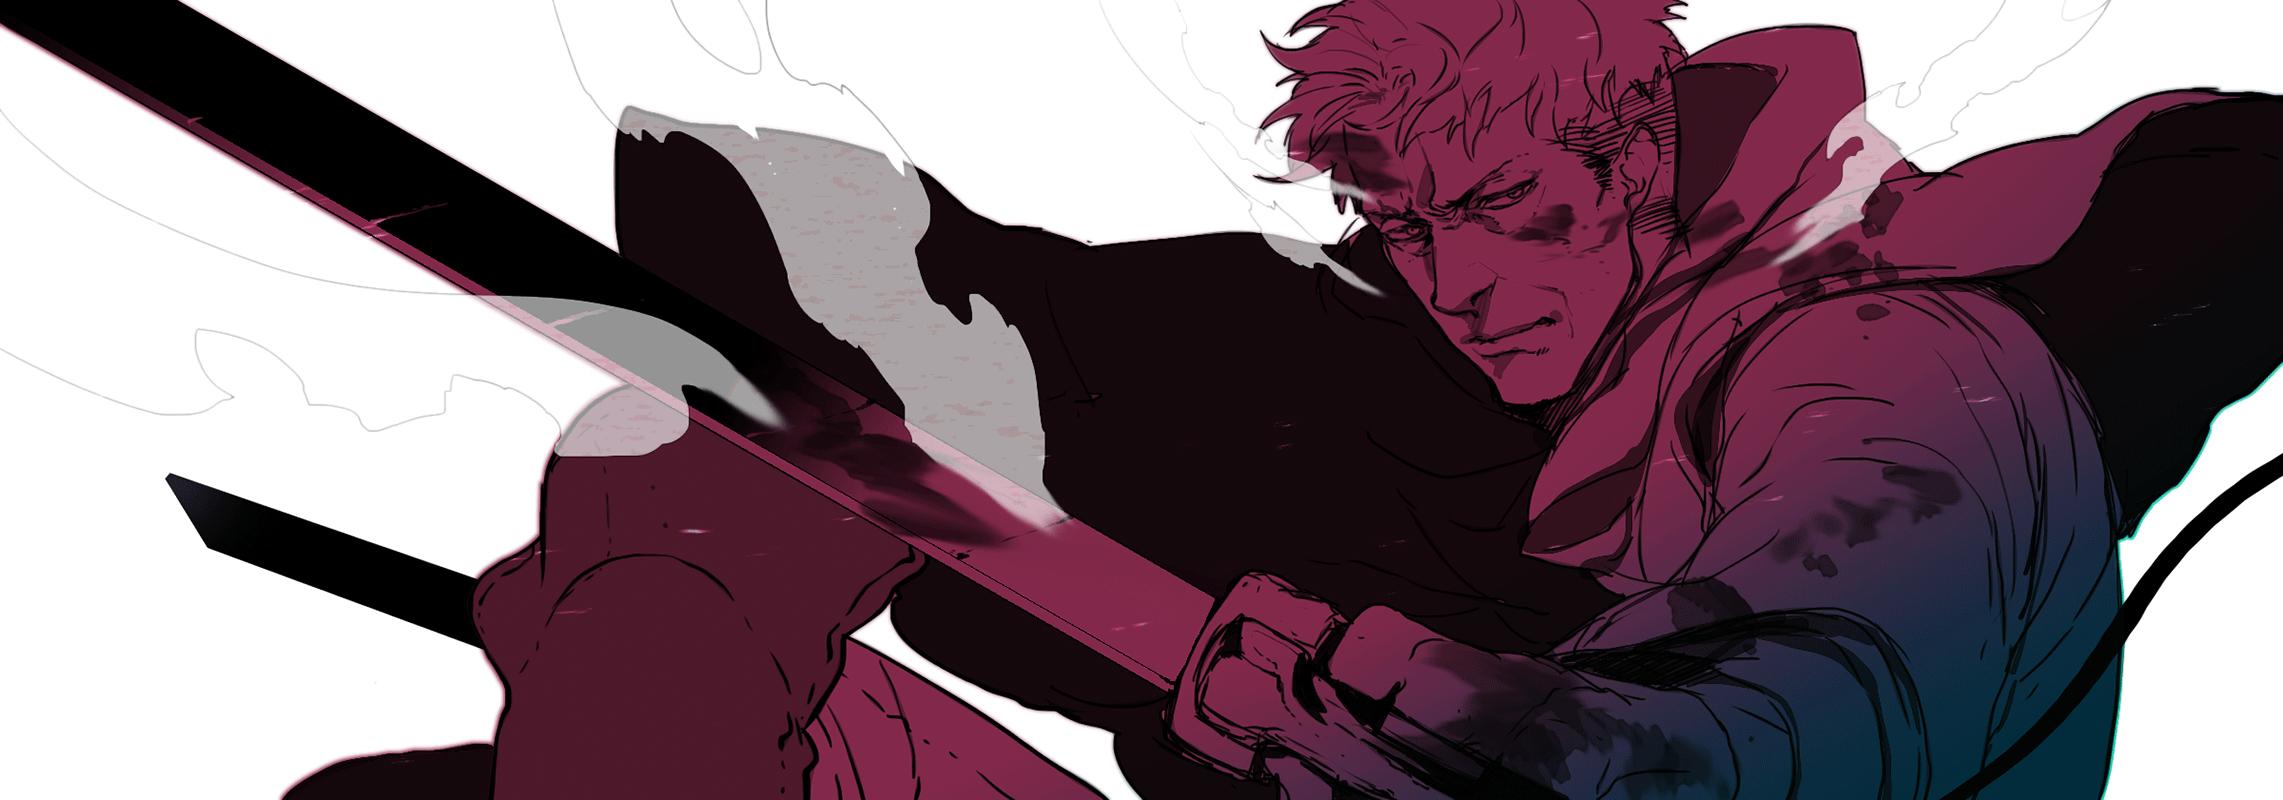 Auruo Bossard Attack On Titan Zerochan Anime Image Board